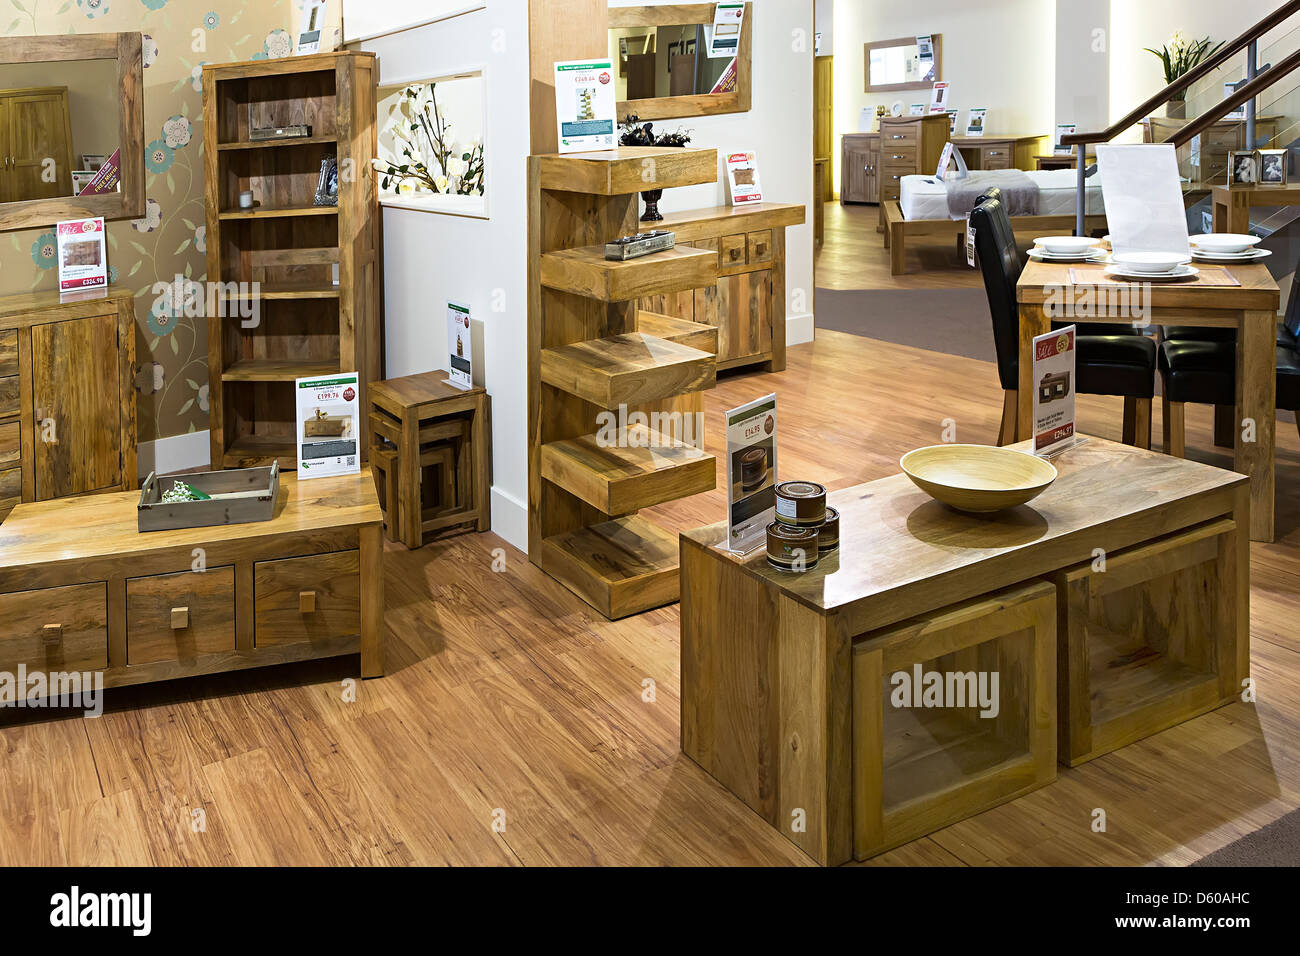 Furniture Store Shop Uk Imágenes De Stock & Furniture Store Shop Uk ...